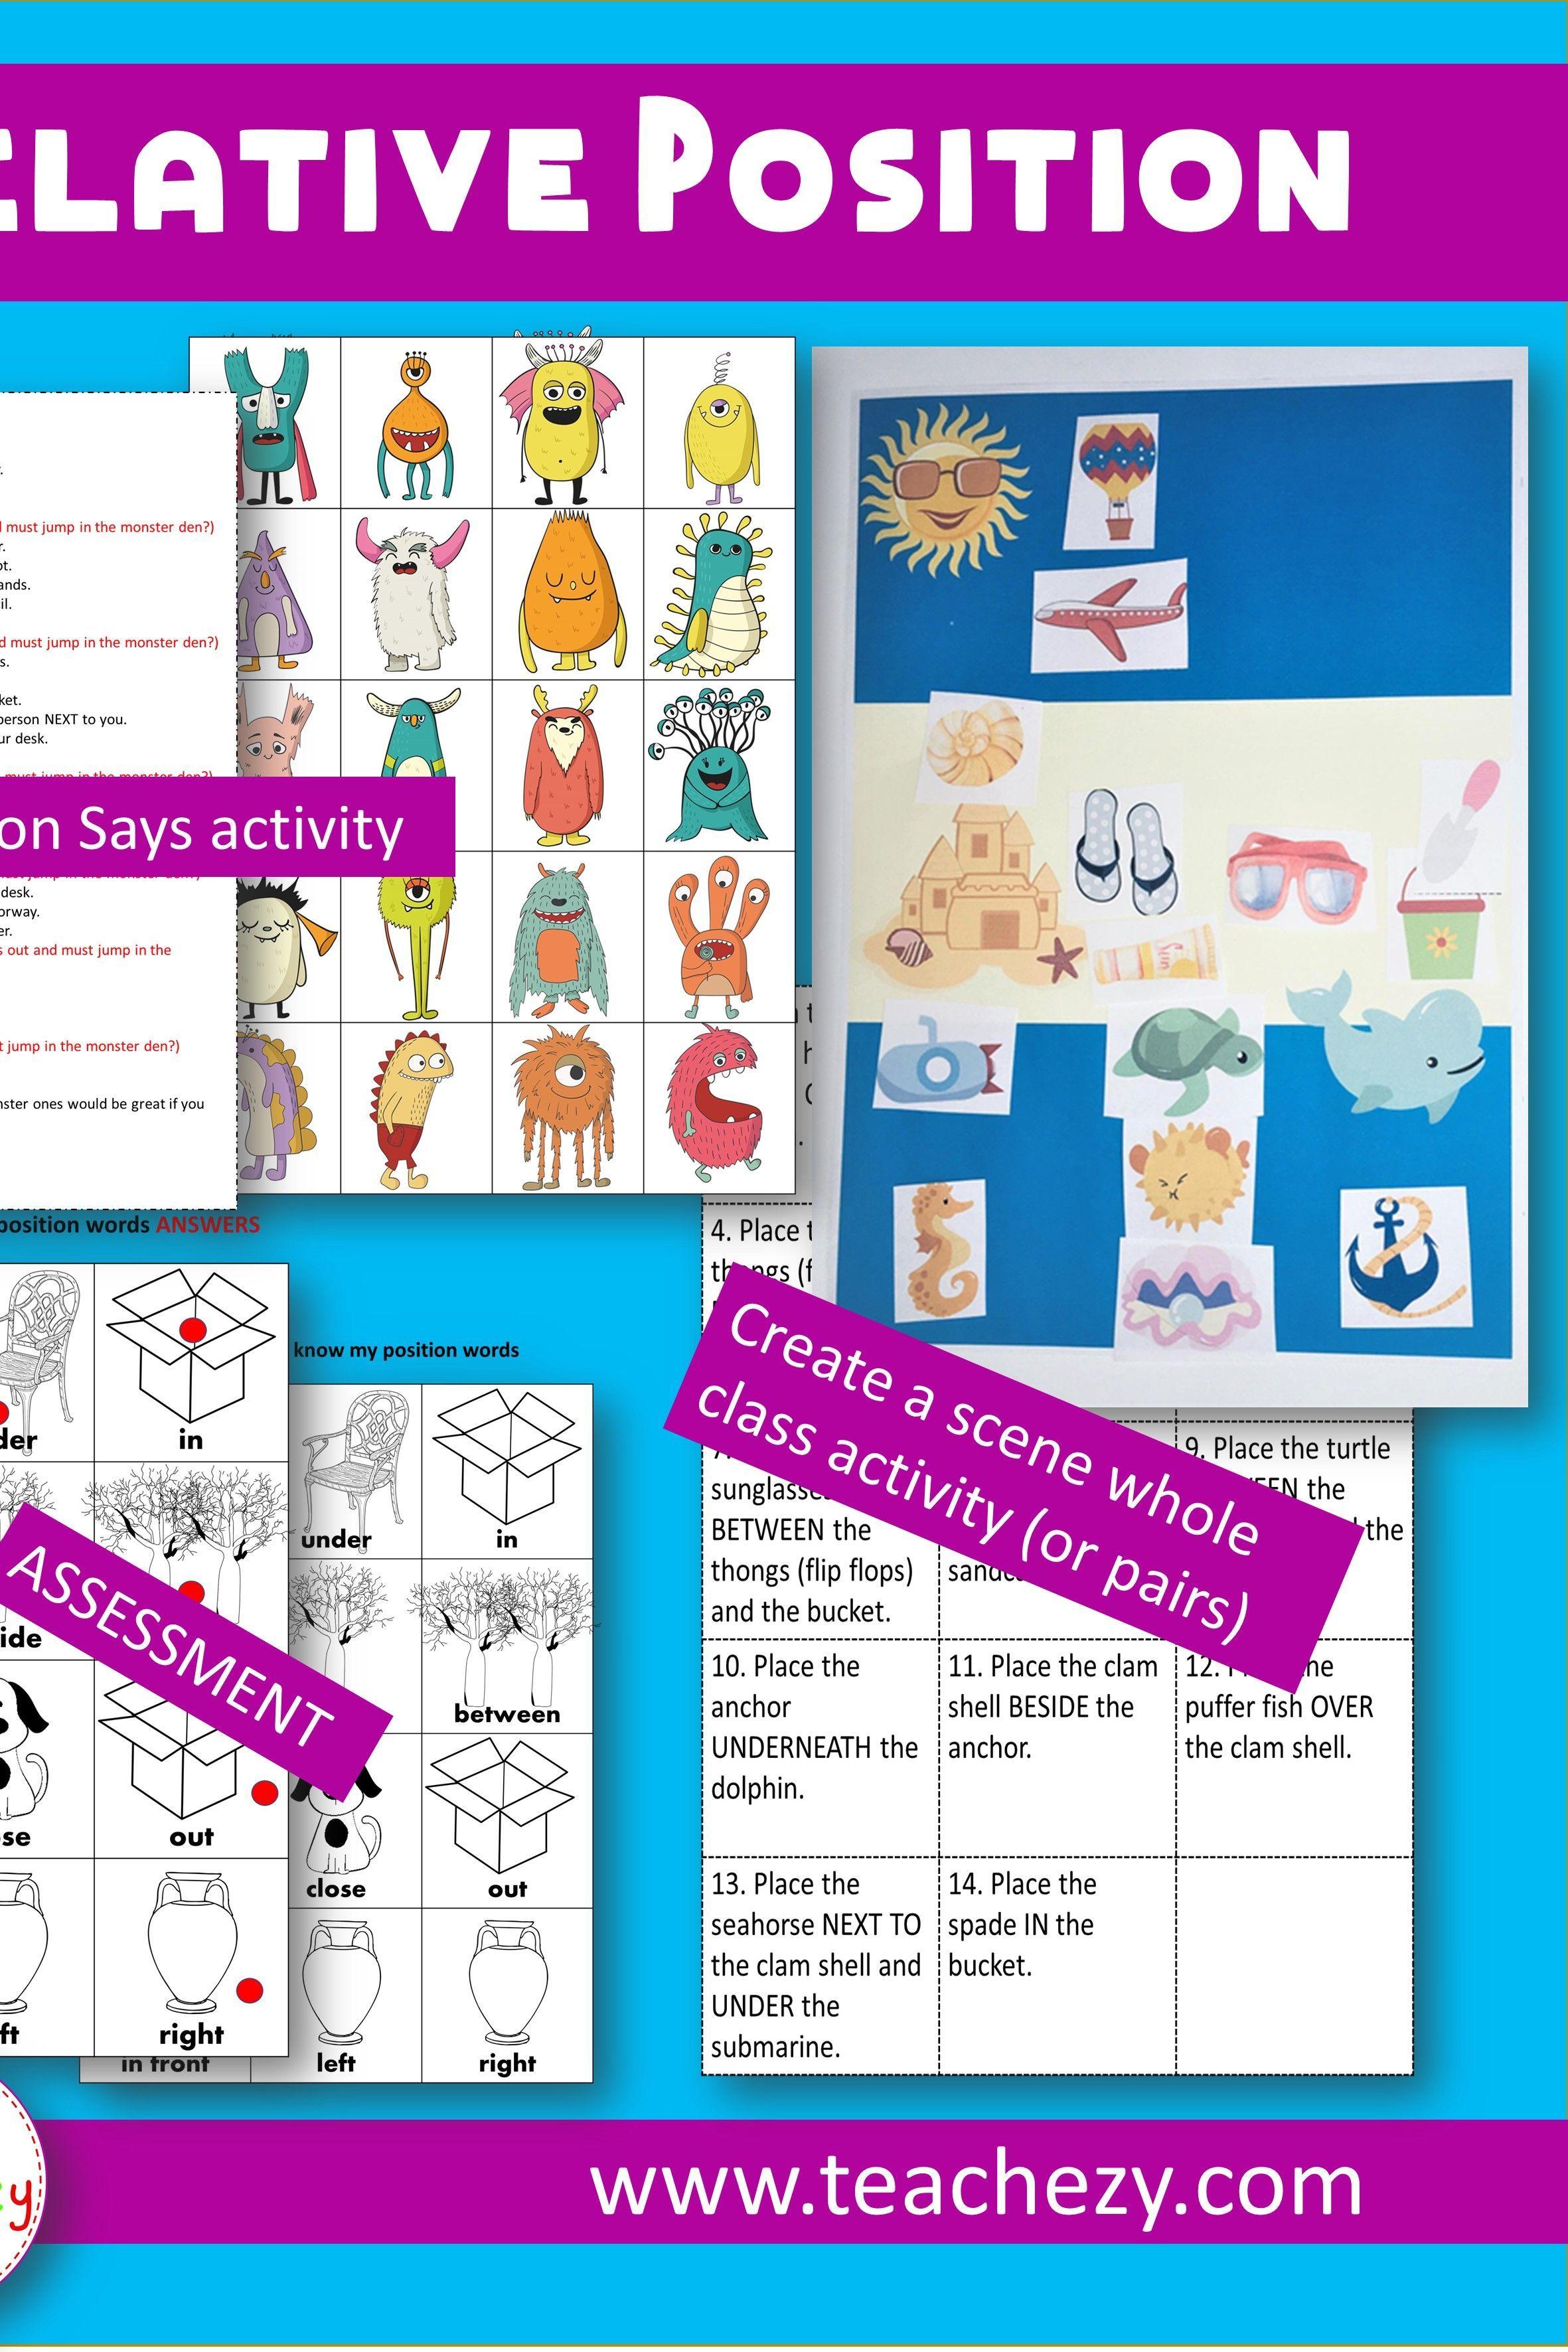 Relative Position Lesson Preschool And Kindergarten Teachezy Kindergarten Math Geometry Lesson Plans Geometry Lessons [ 3543 x 2362 Pixel ]